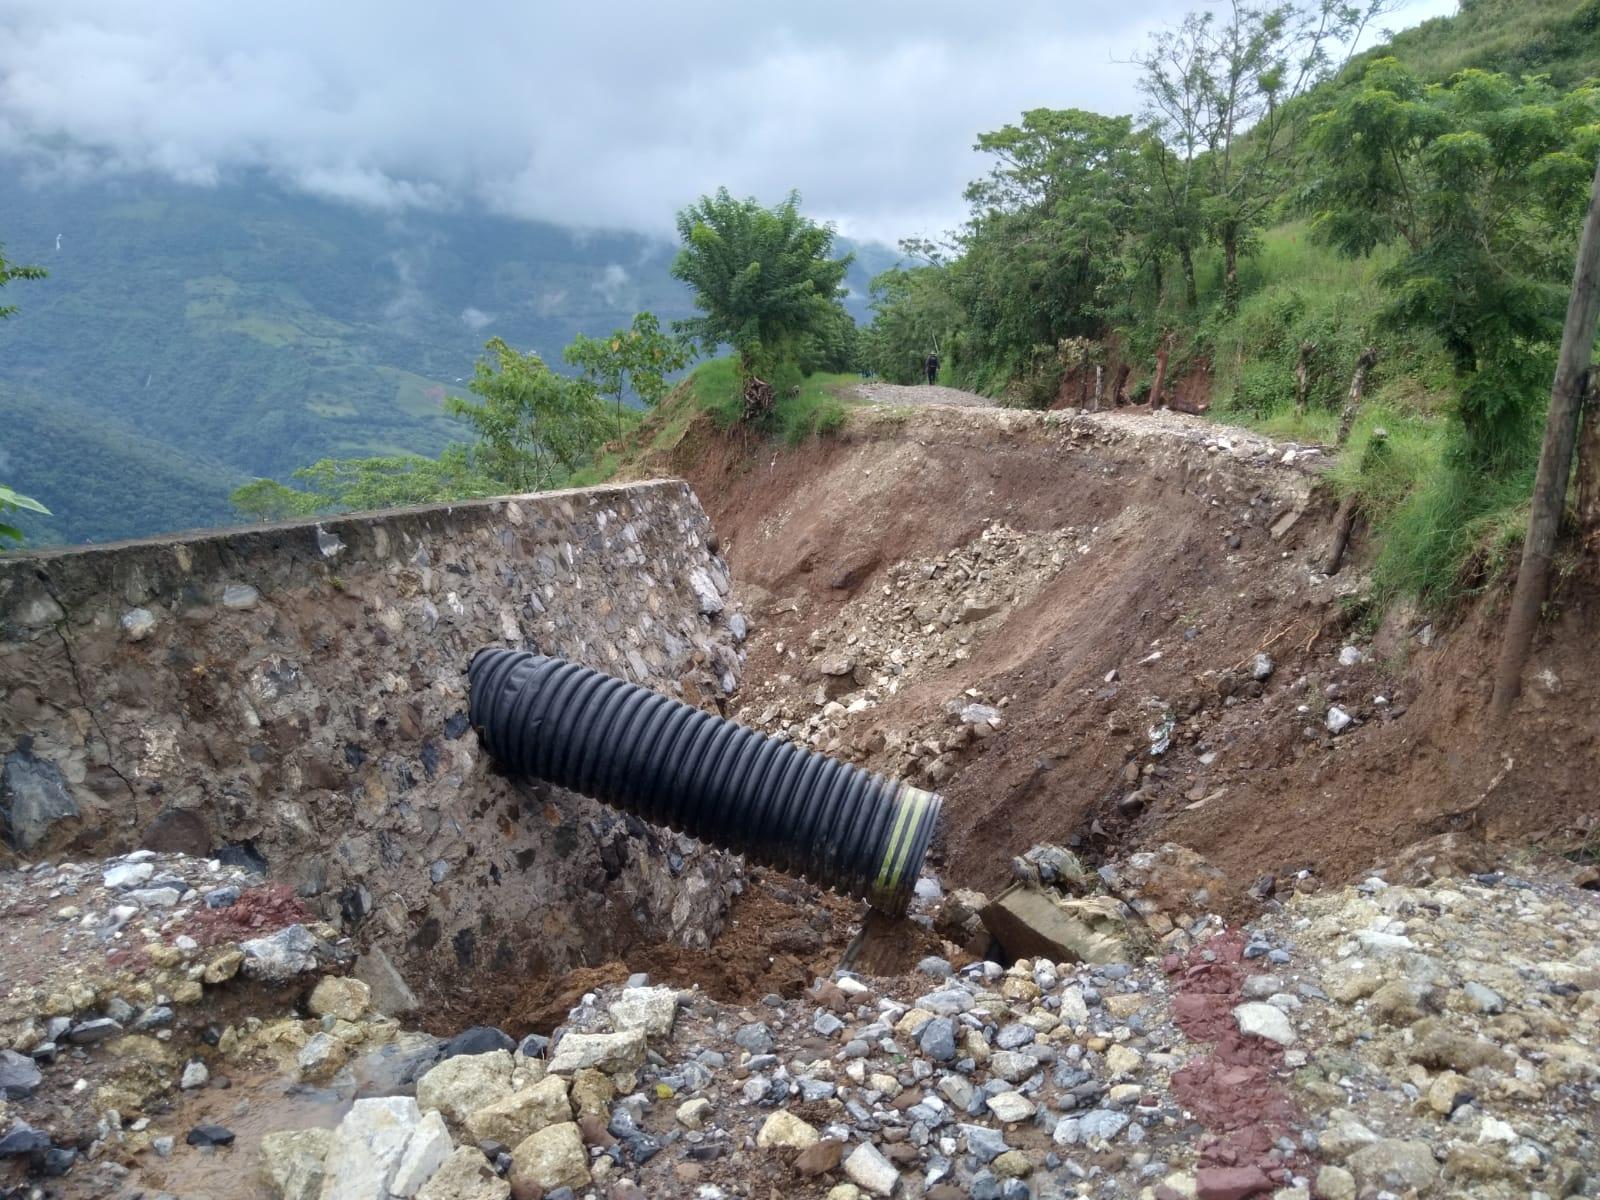 Derrumbe deja incomunicado a San Felipe Tepatlán